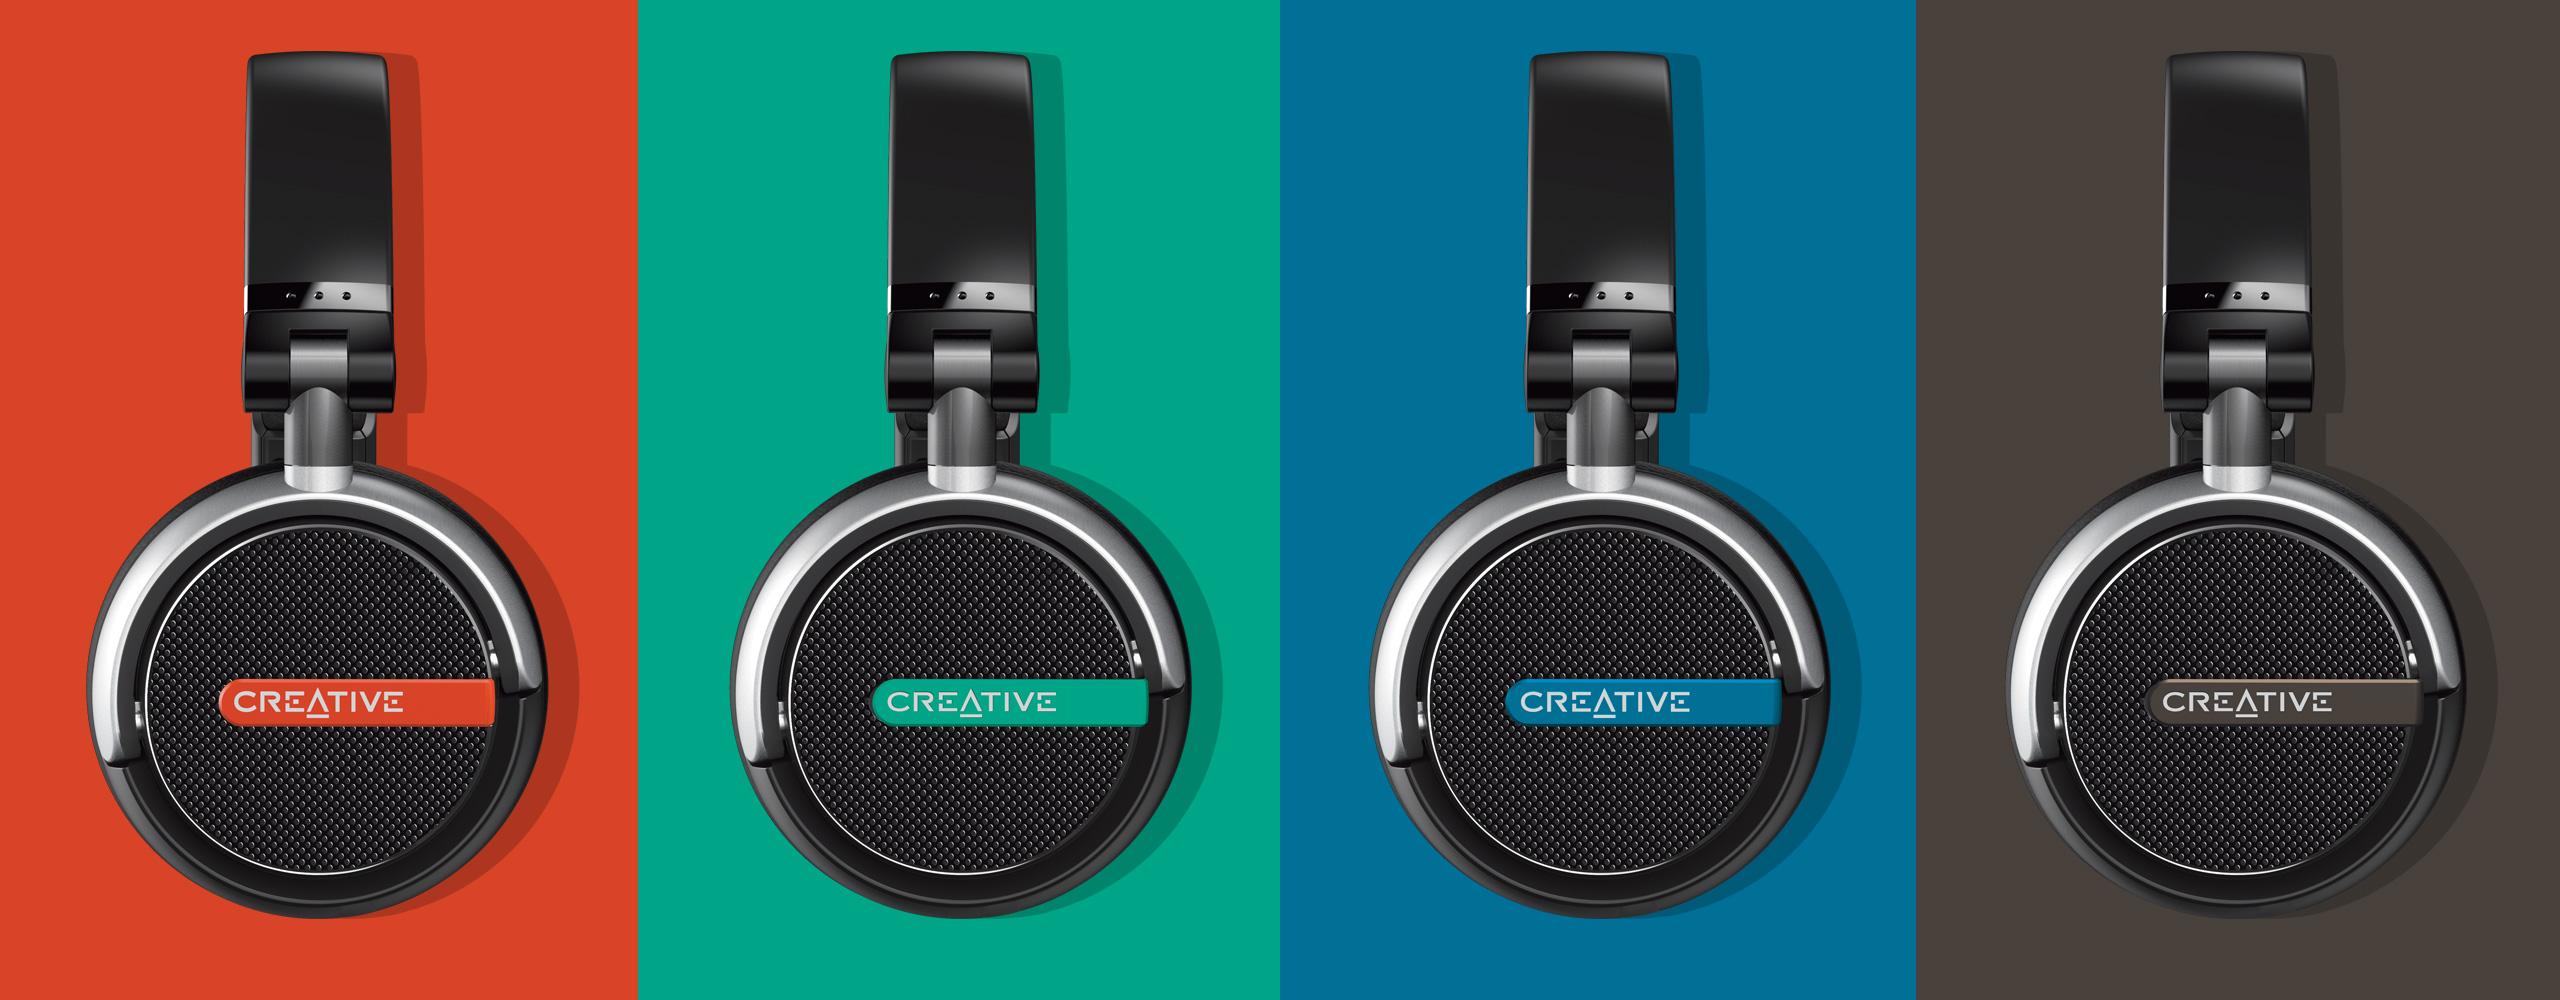 concours-casque-creative-flex4